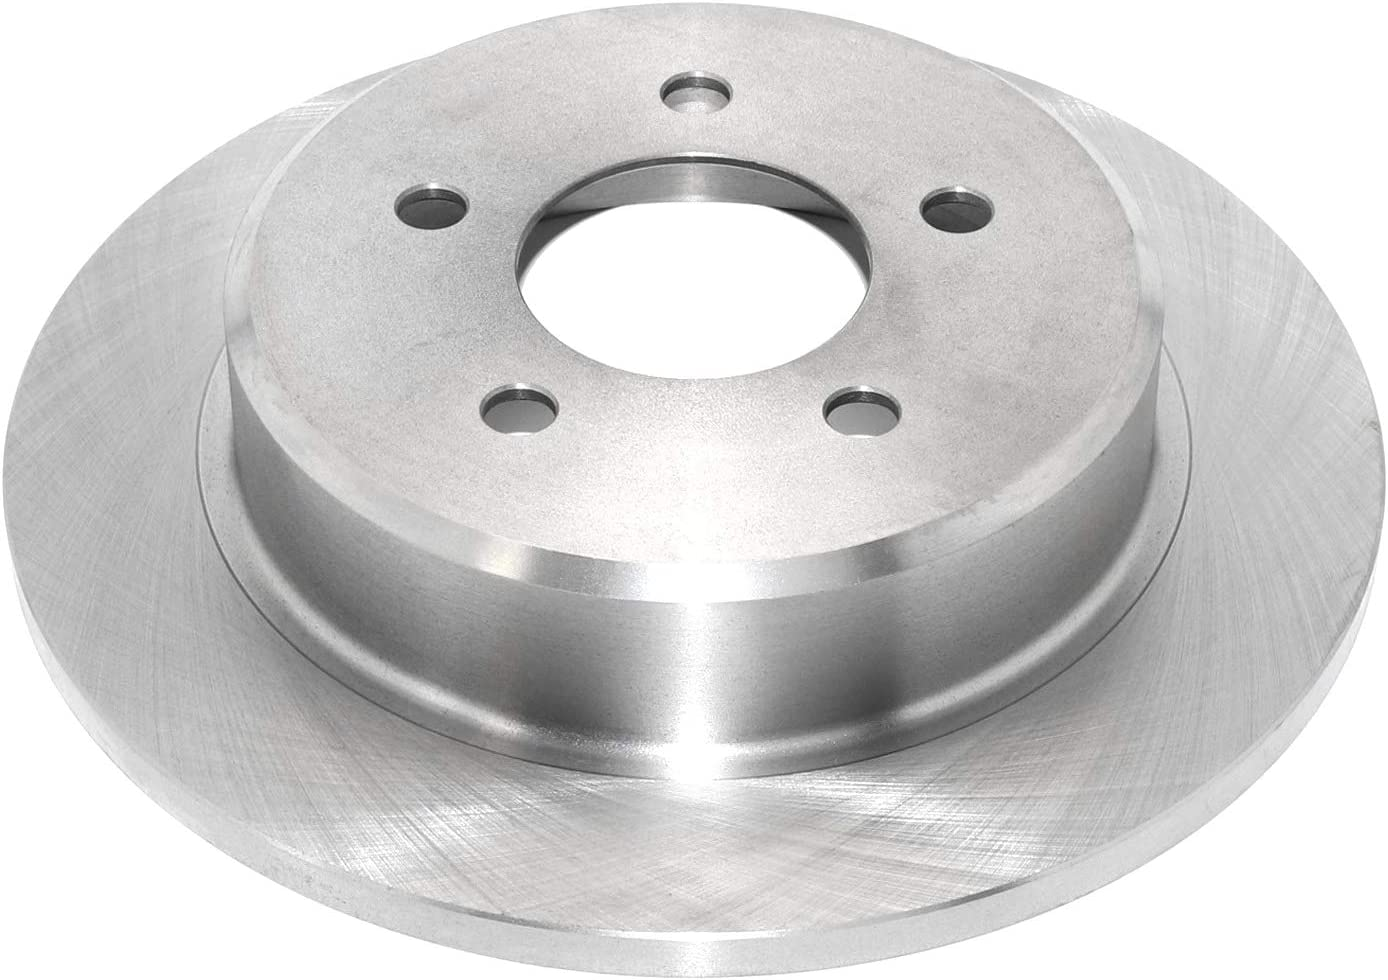 DuraGo BR538302 Rear Solid Disc Premium Electrophoretic Brake Rotor